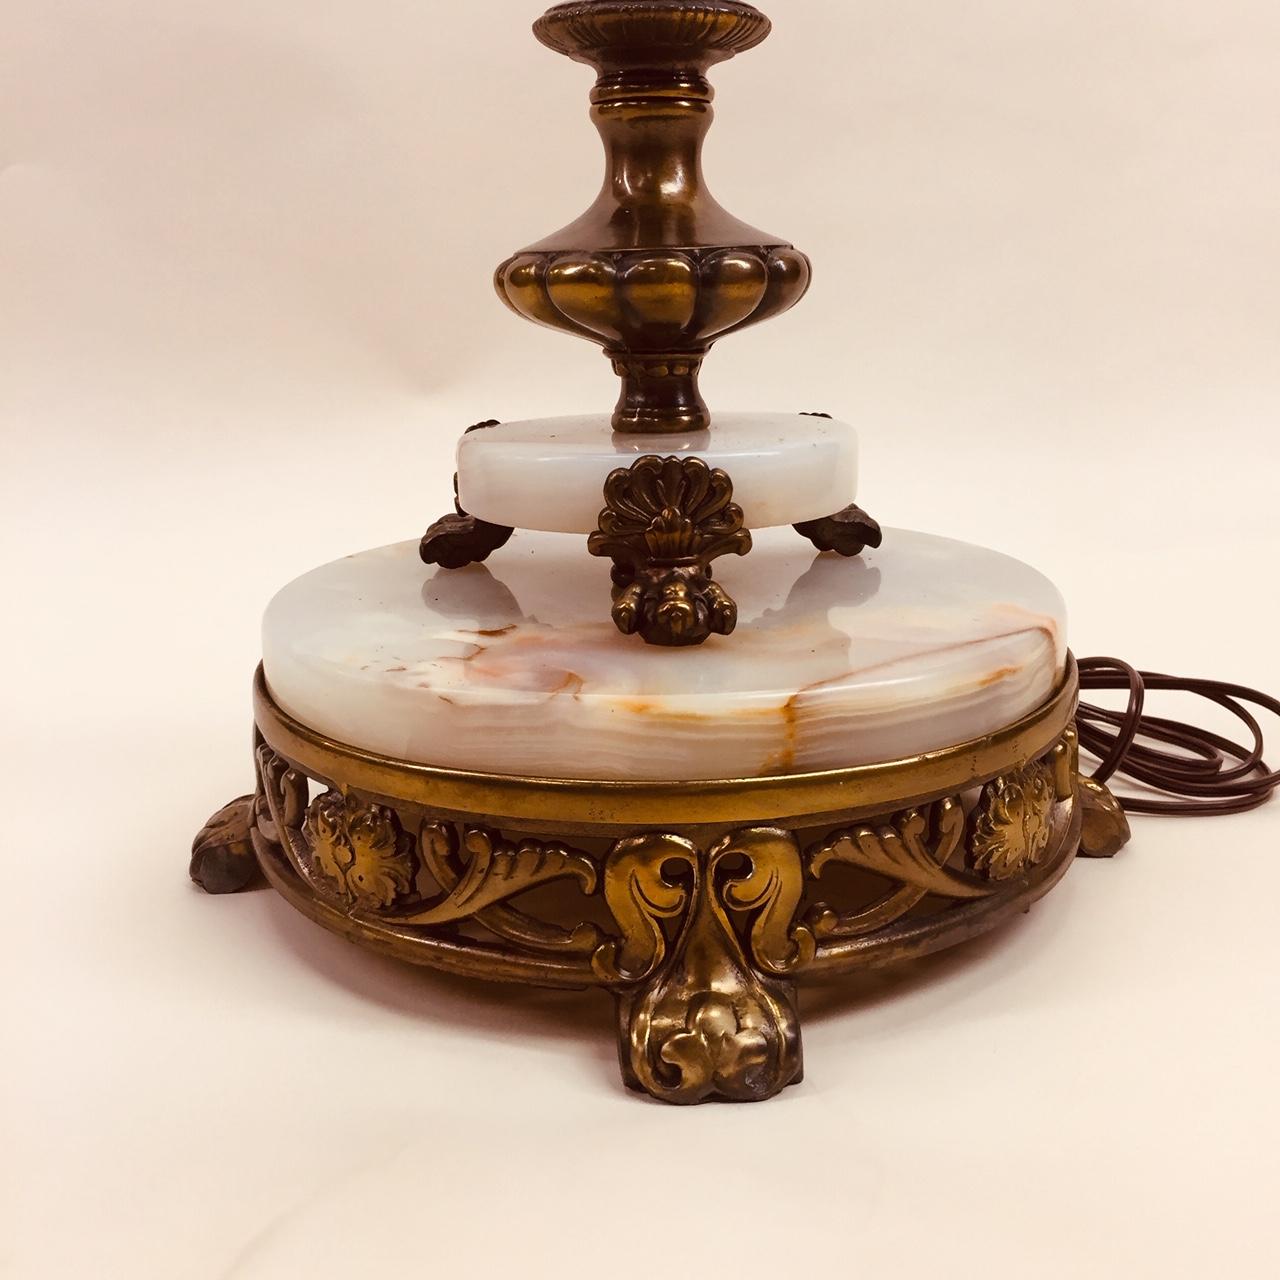 Original 1930s Torchiere Floor Lamp Old Lamps Amp Things Llc